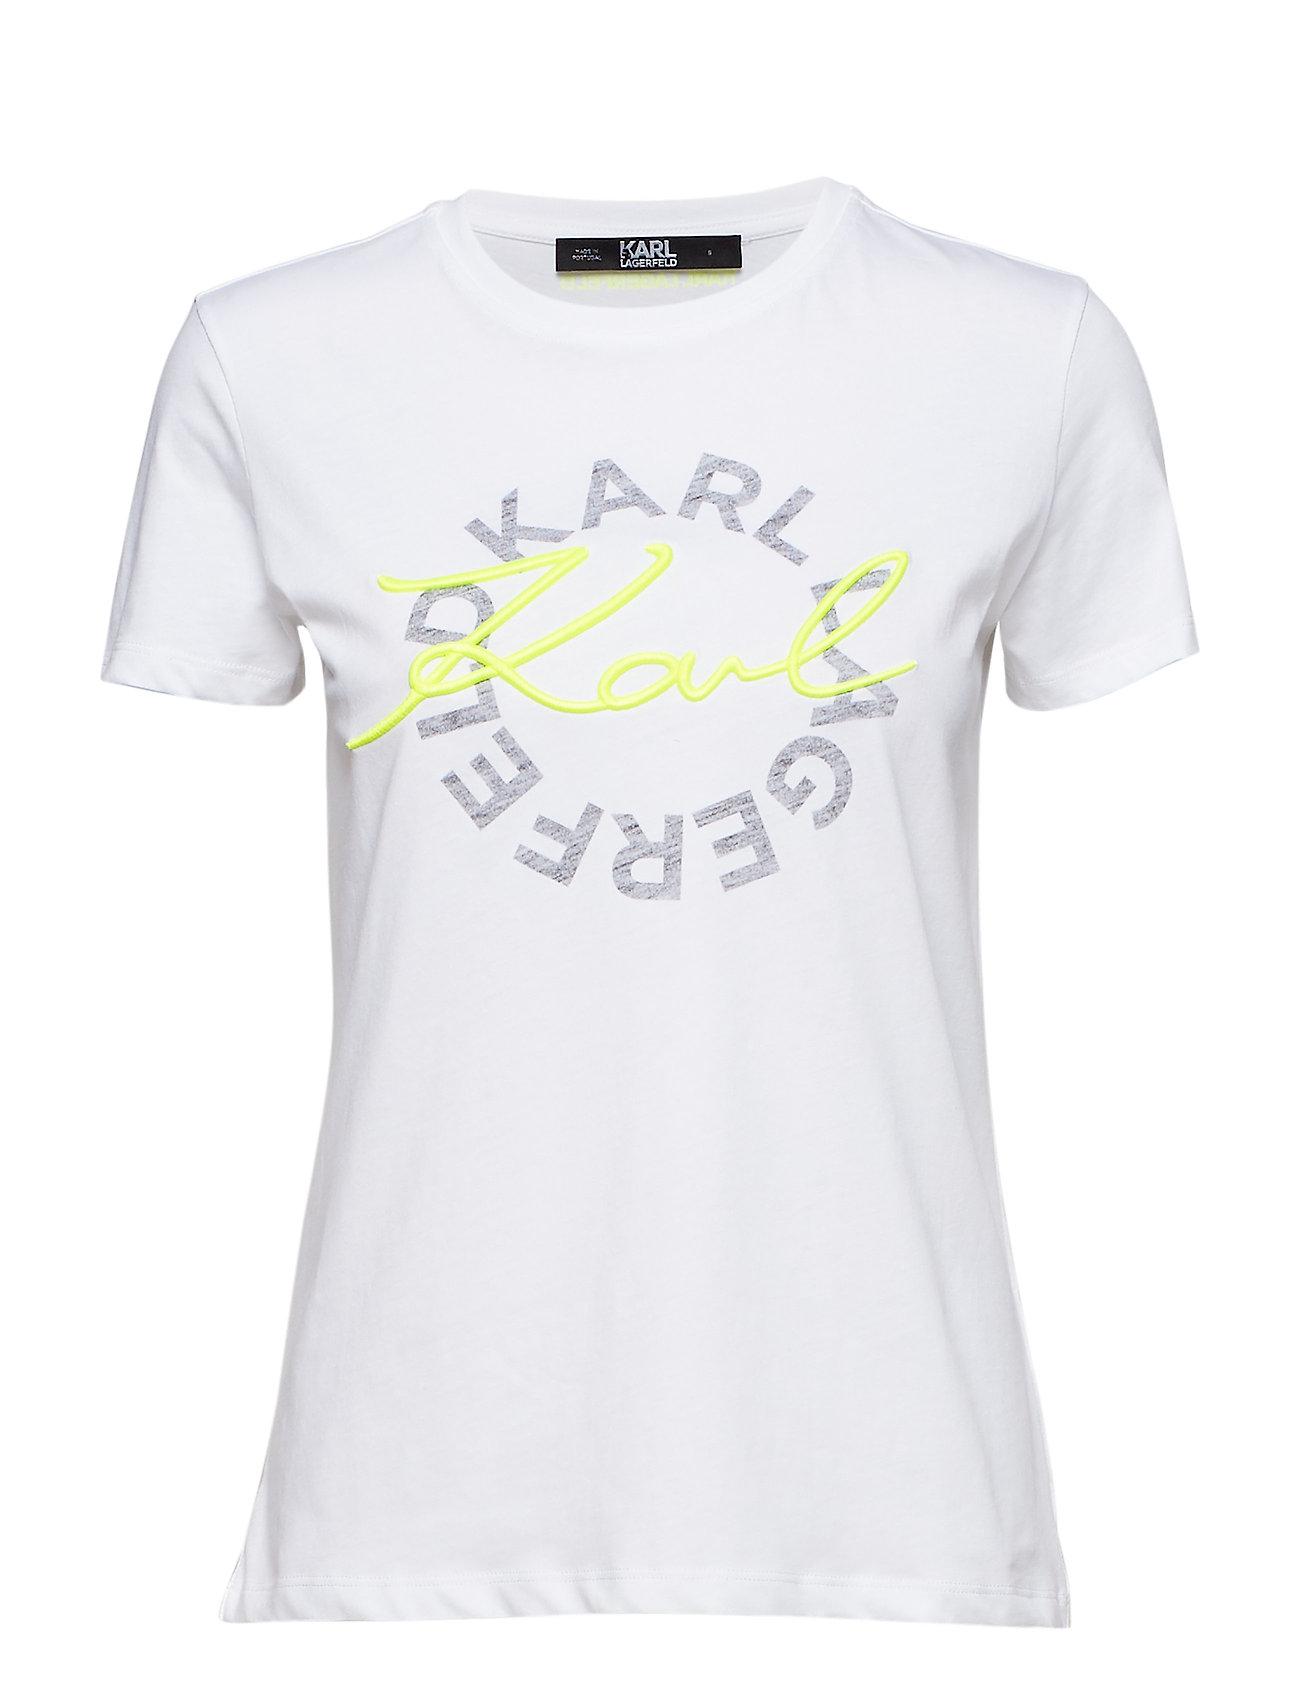 Karl Lagerfeld Neon Lights Dbl Logo T-Shirt